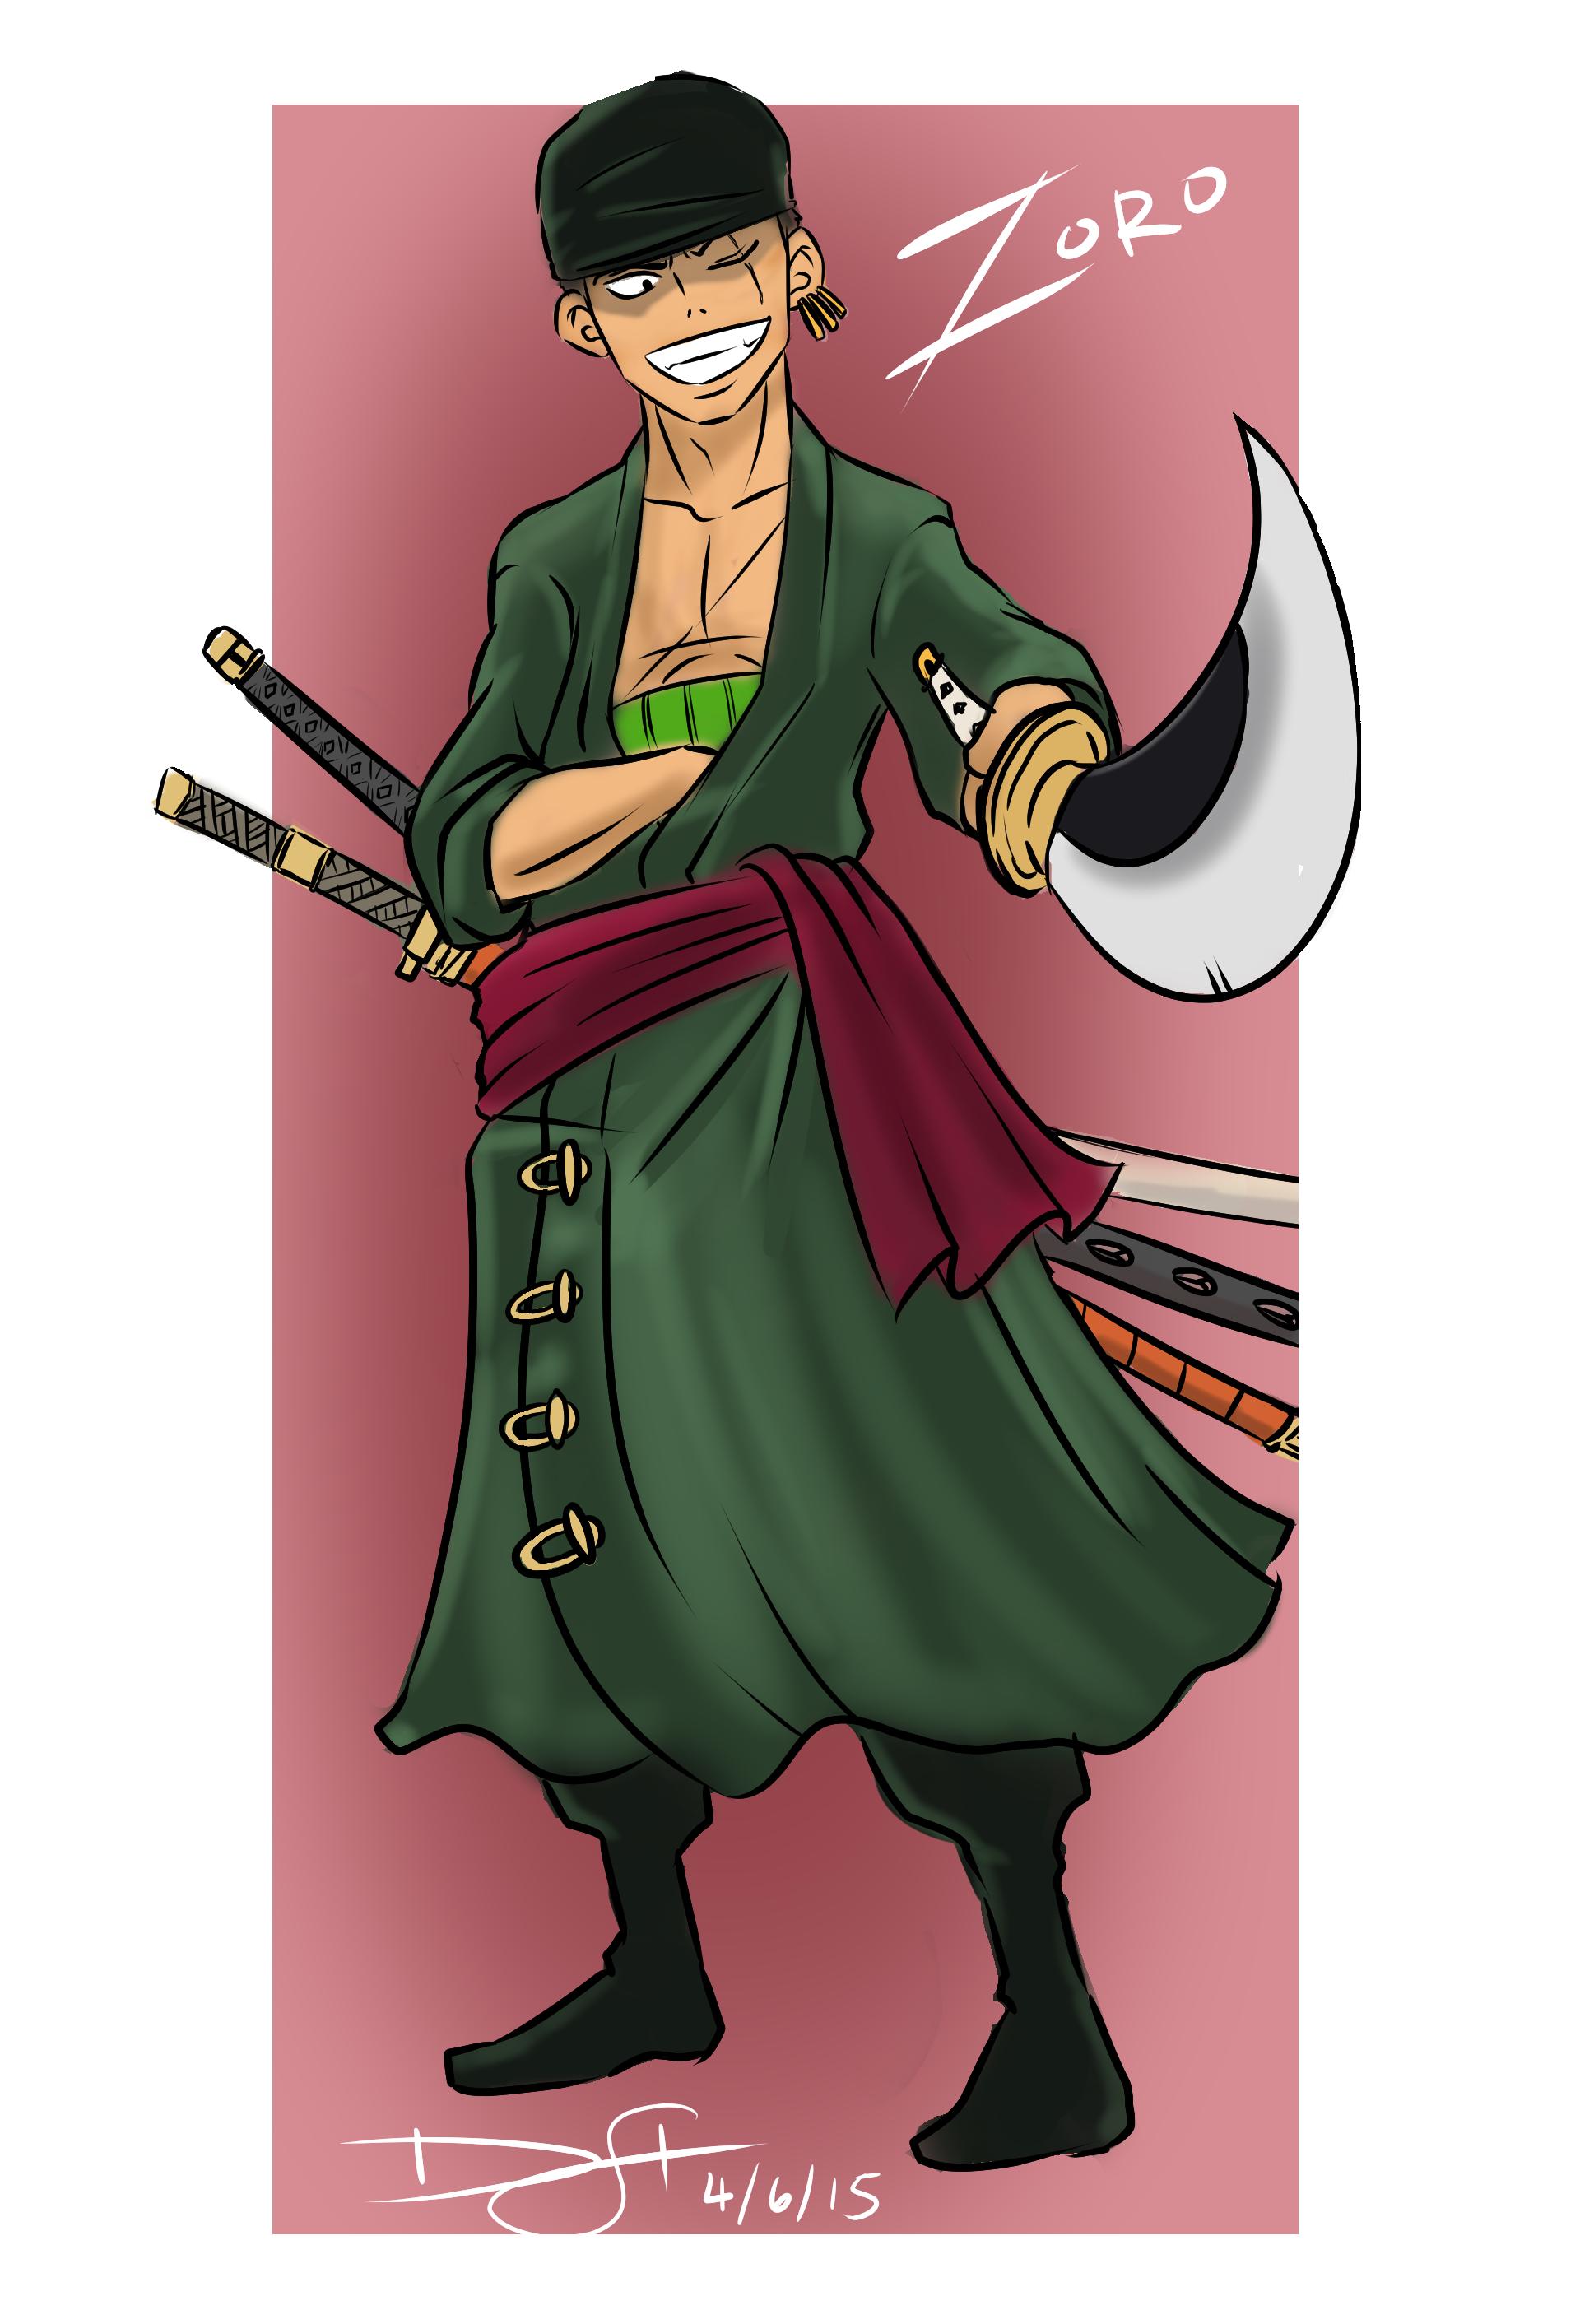 One Piece - Roronoa Zoro by DeeSeeDraws on Newgrounds